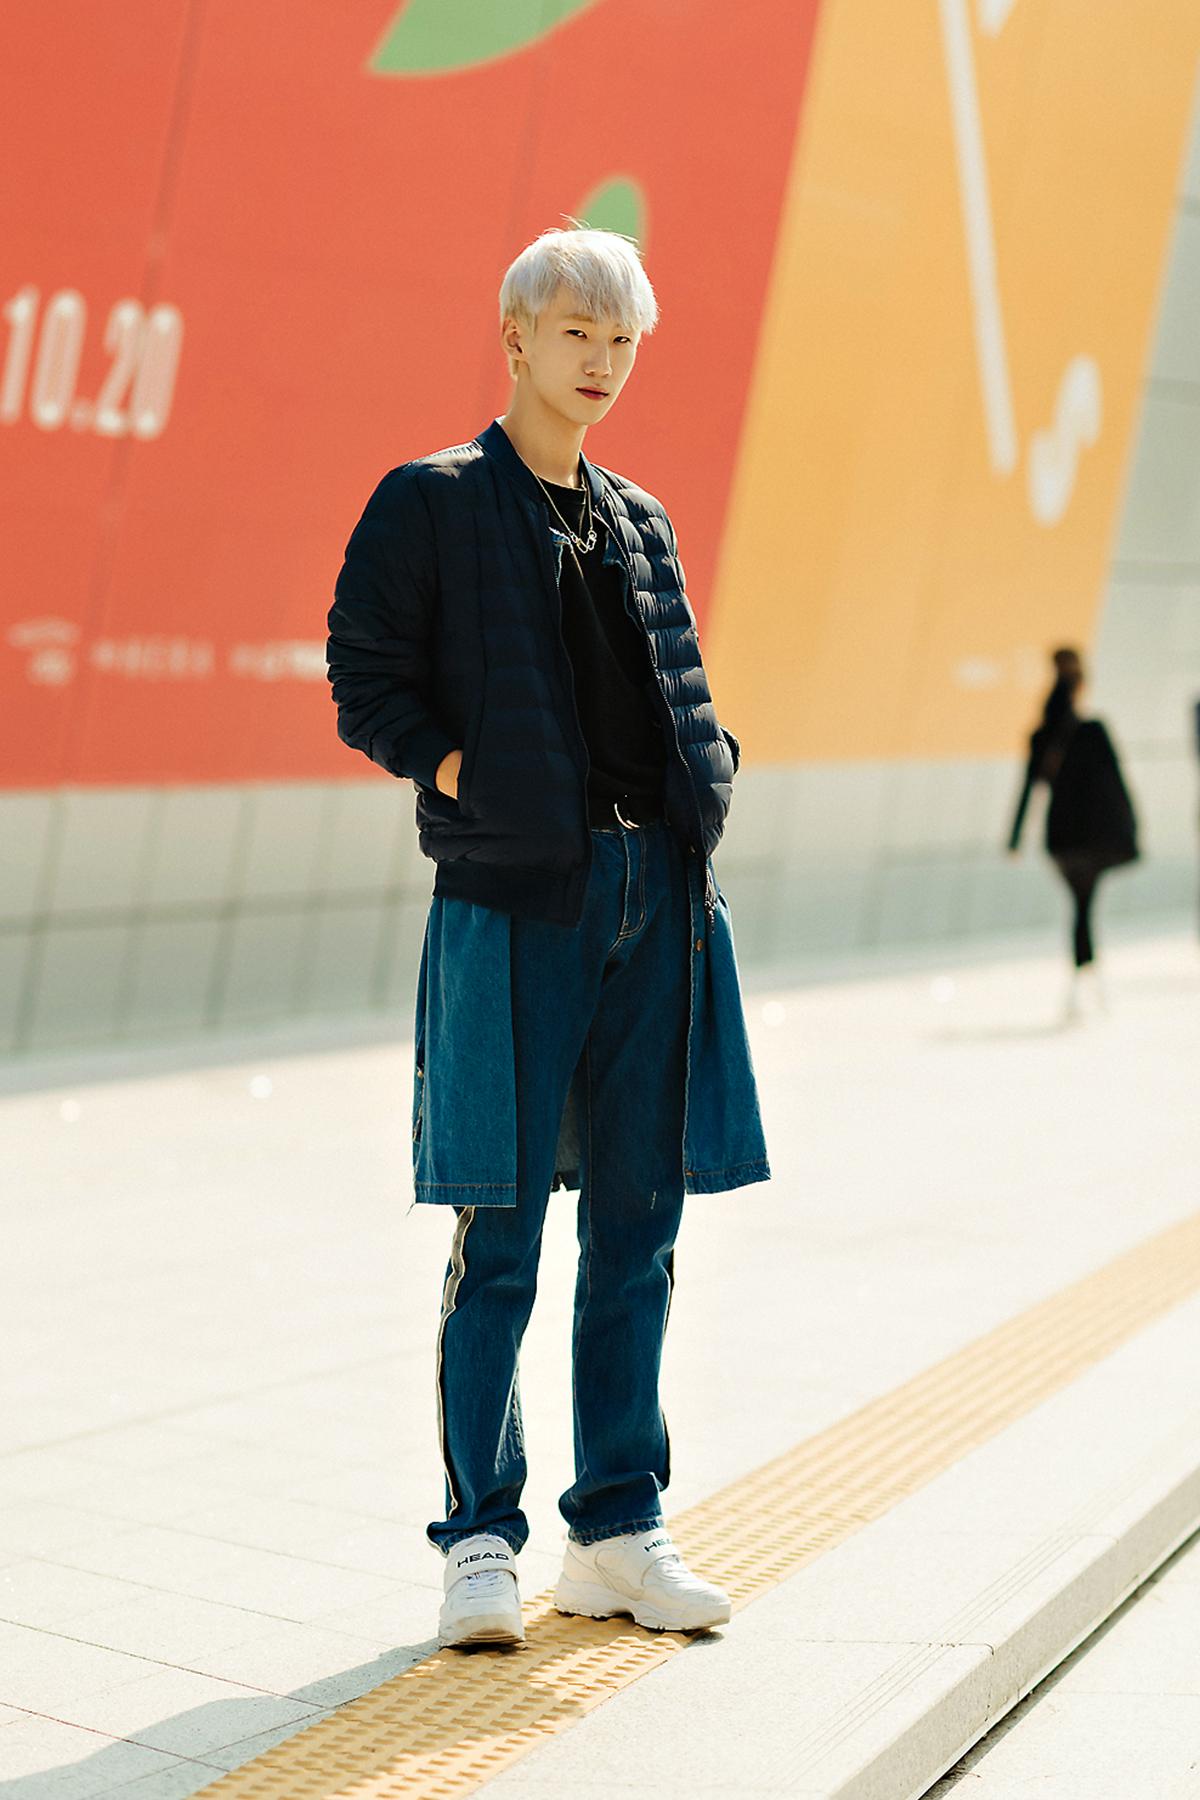 MUSINSA STANDARD LIGHT DOWN Menswear Hera Seoul Fashionweek 2019 SS19